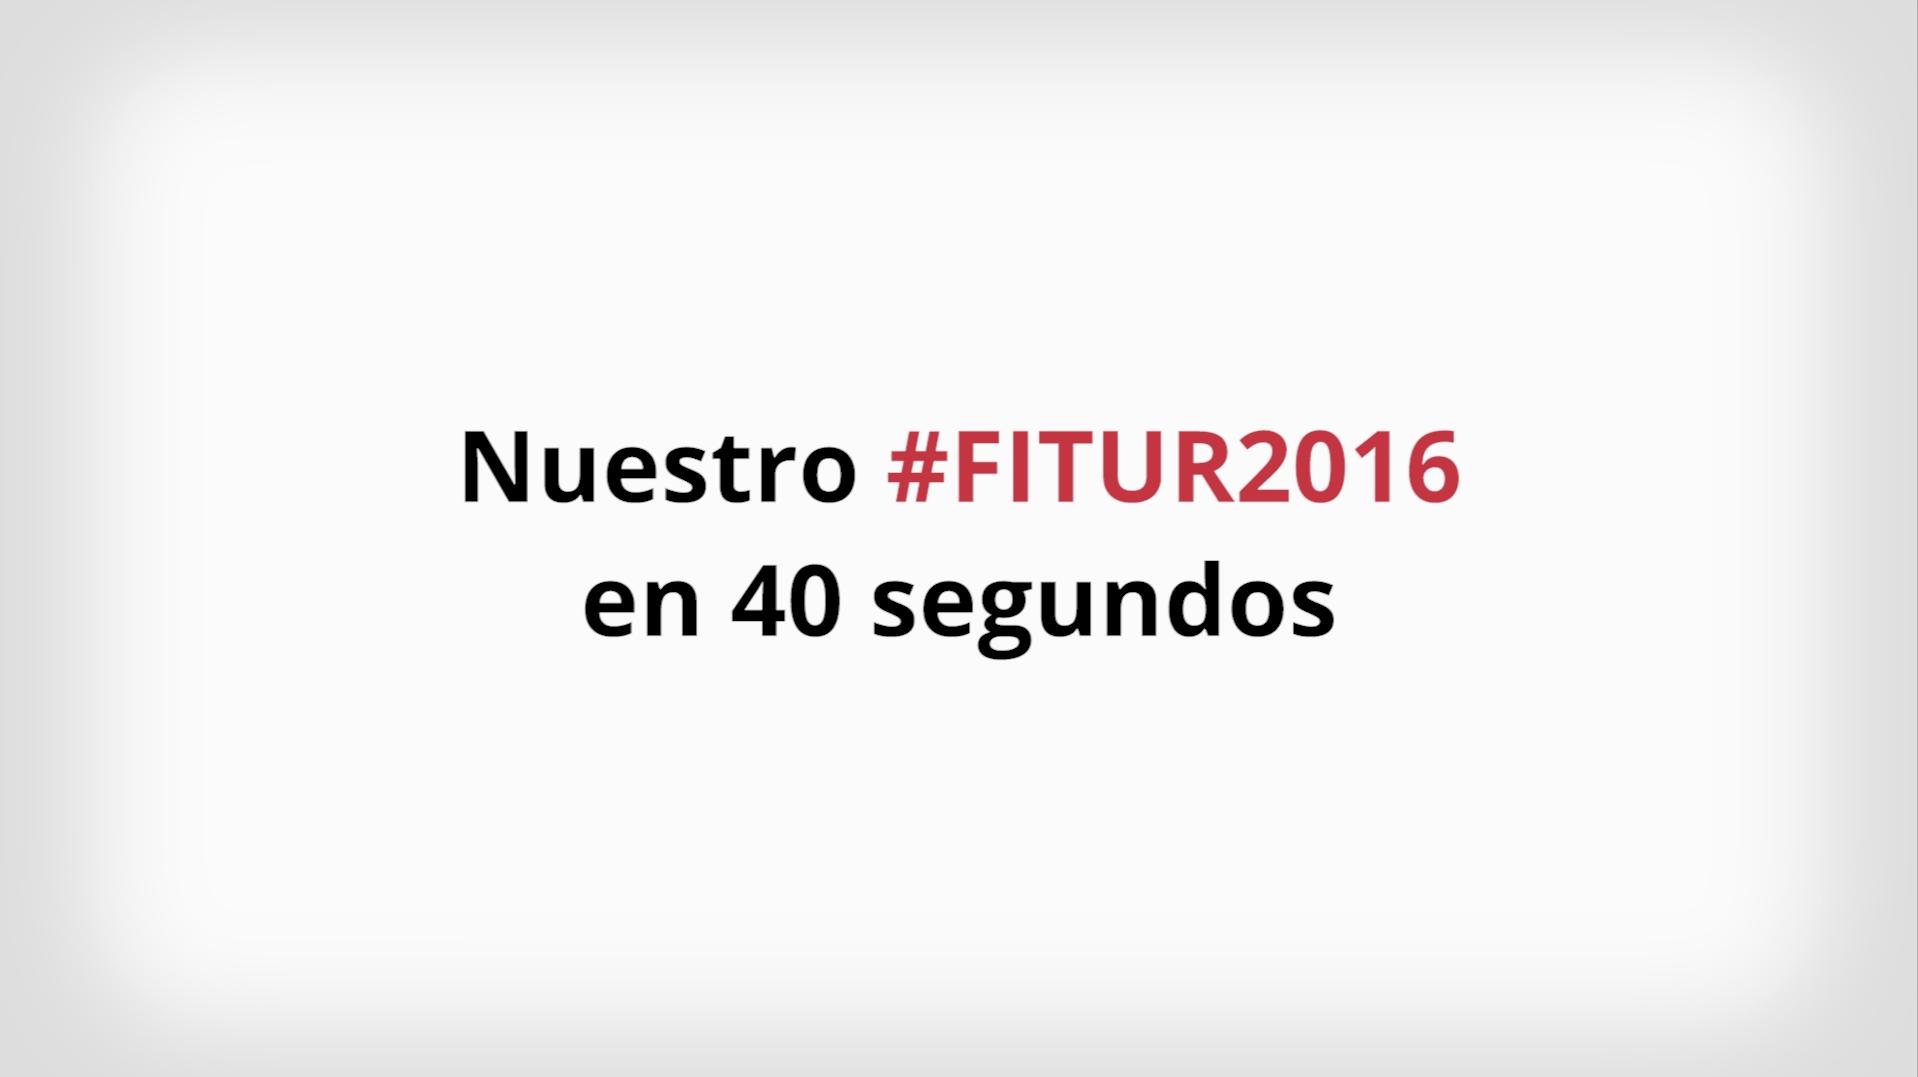 Turijobs en FITUR 2016